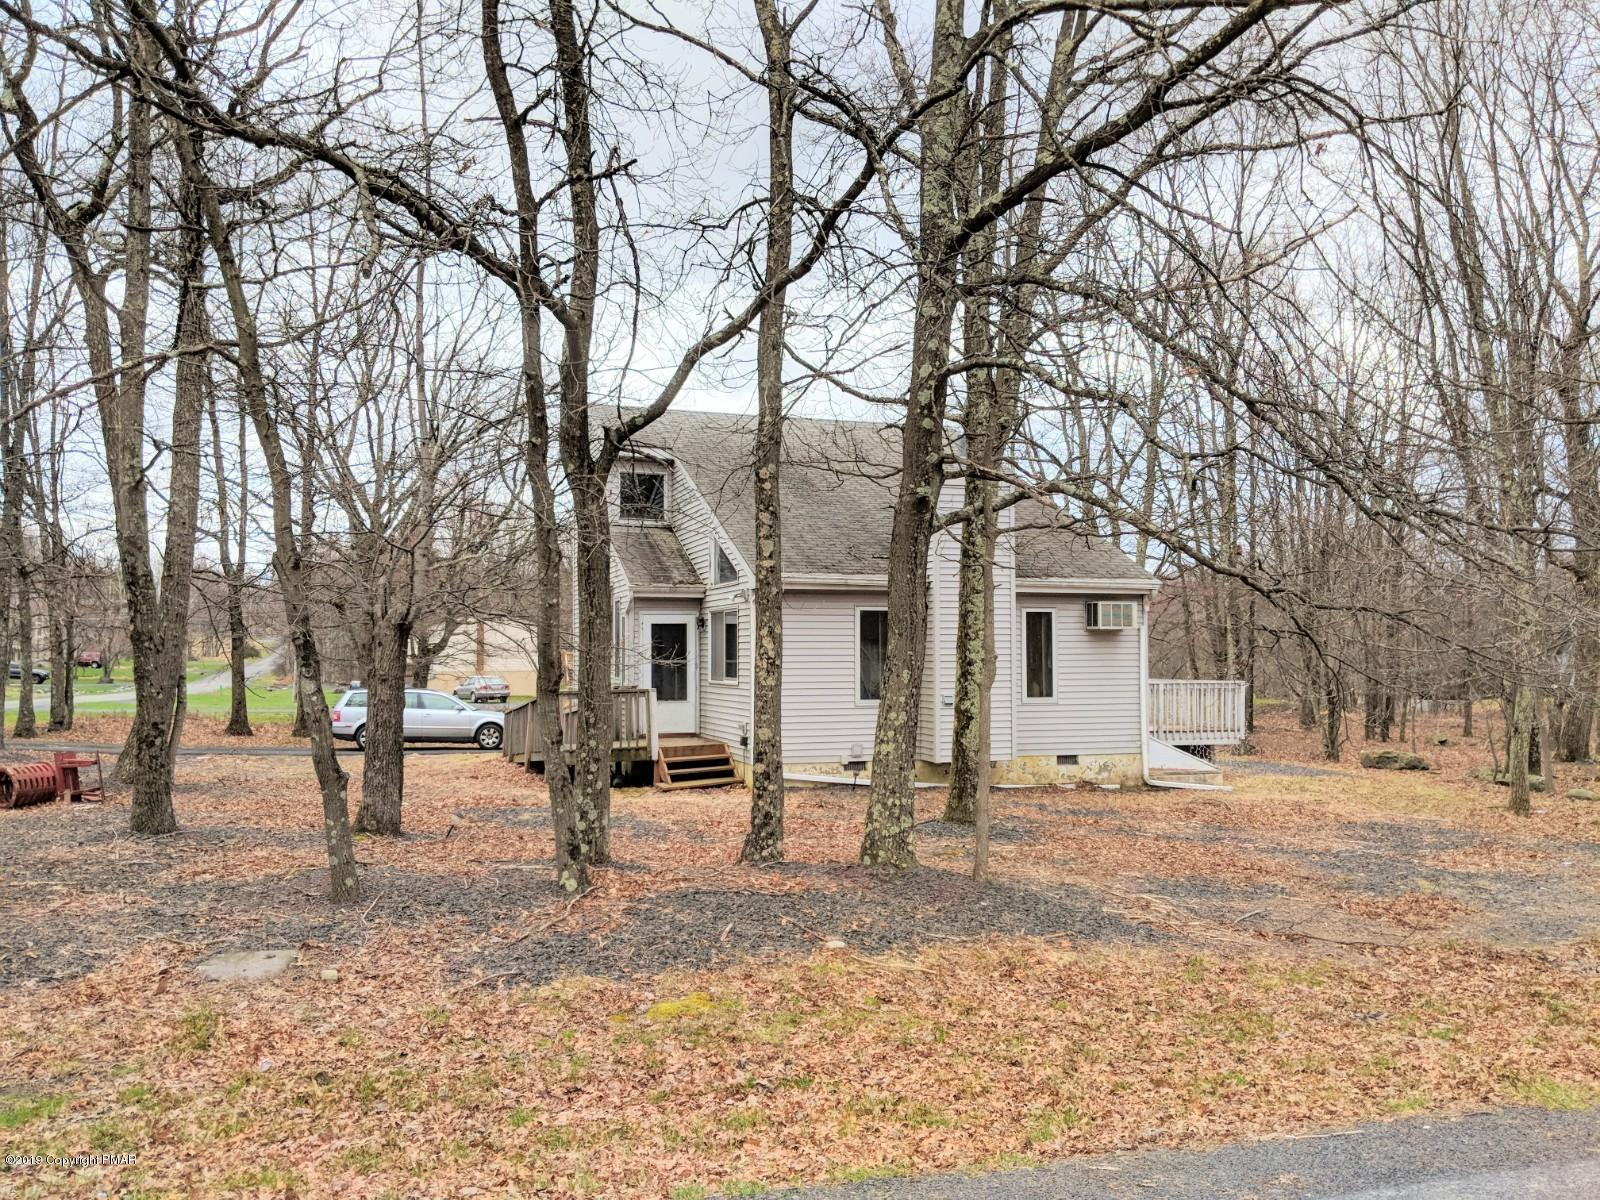 1163 Steele Cir, Bushkill, PA 18324